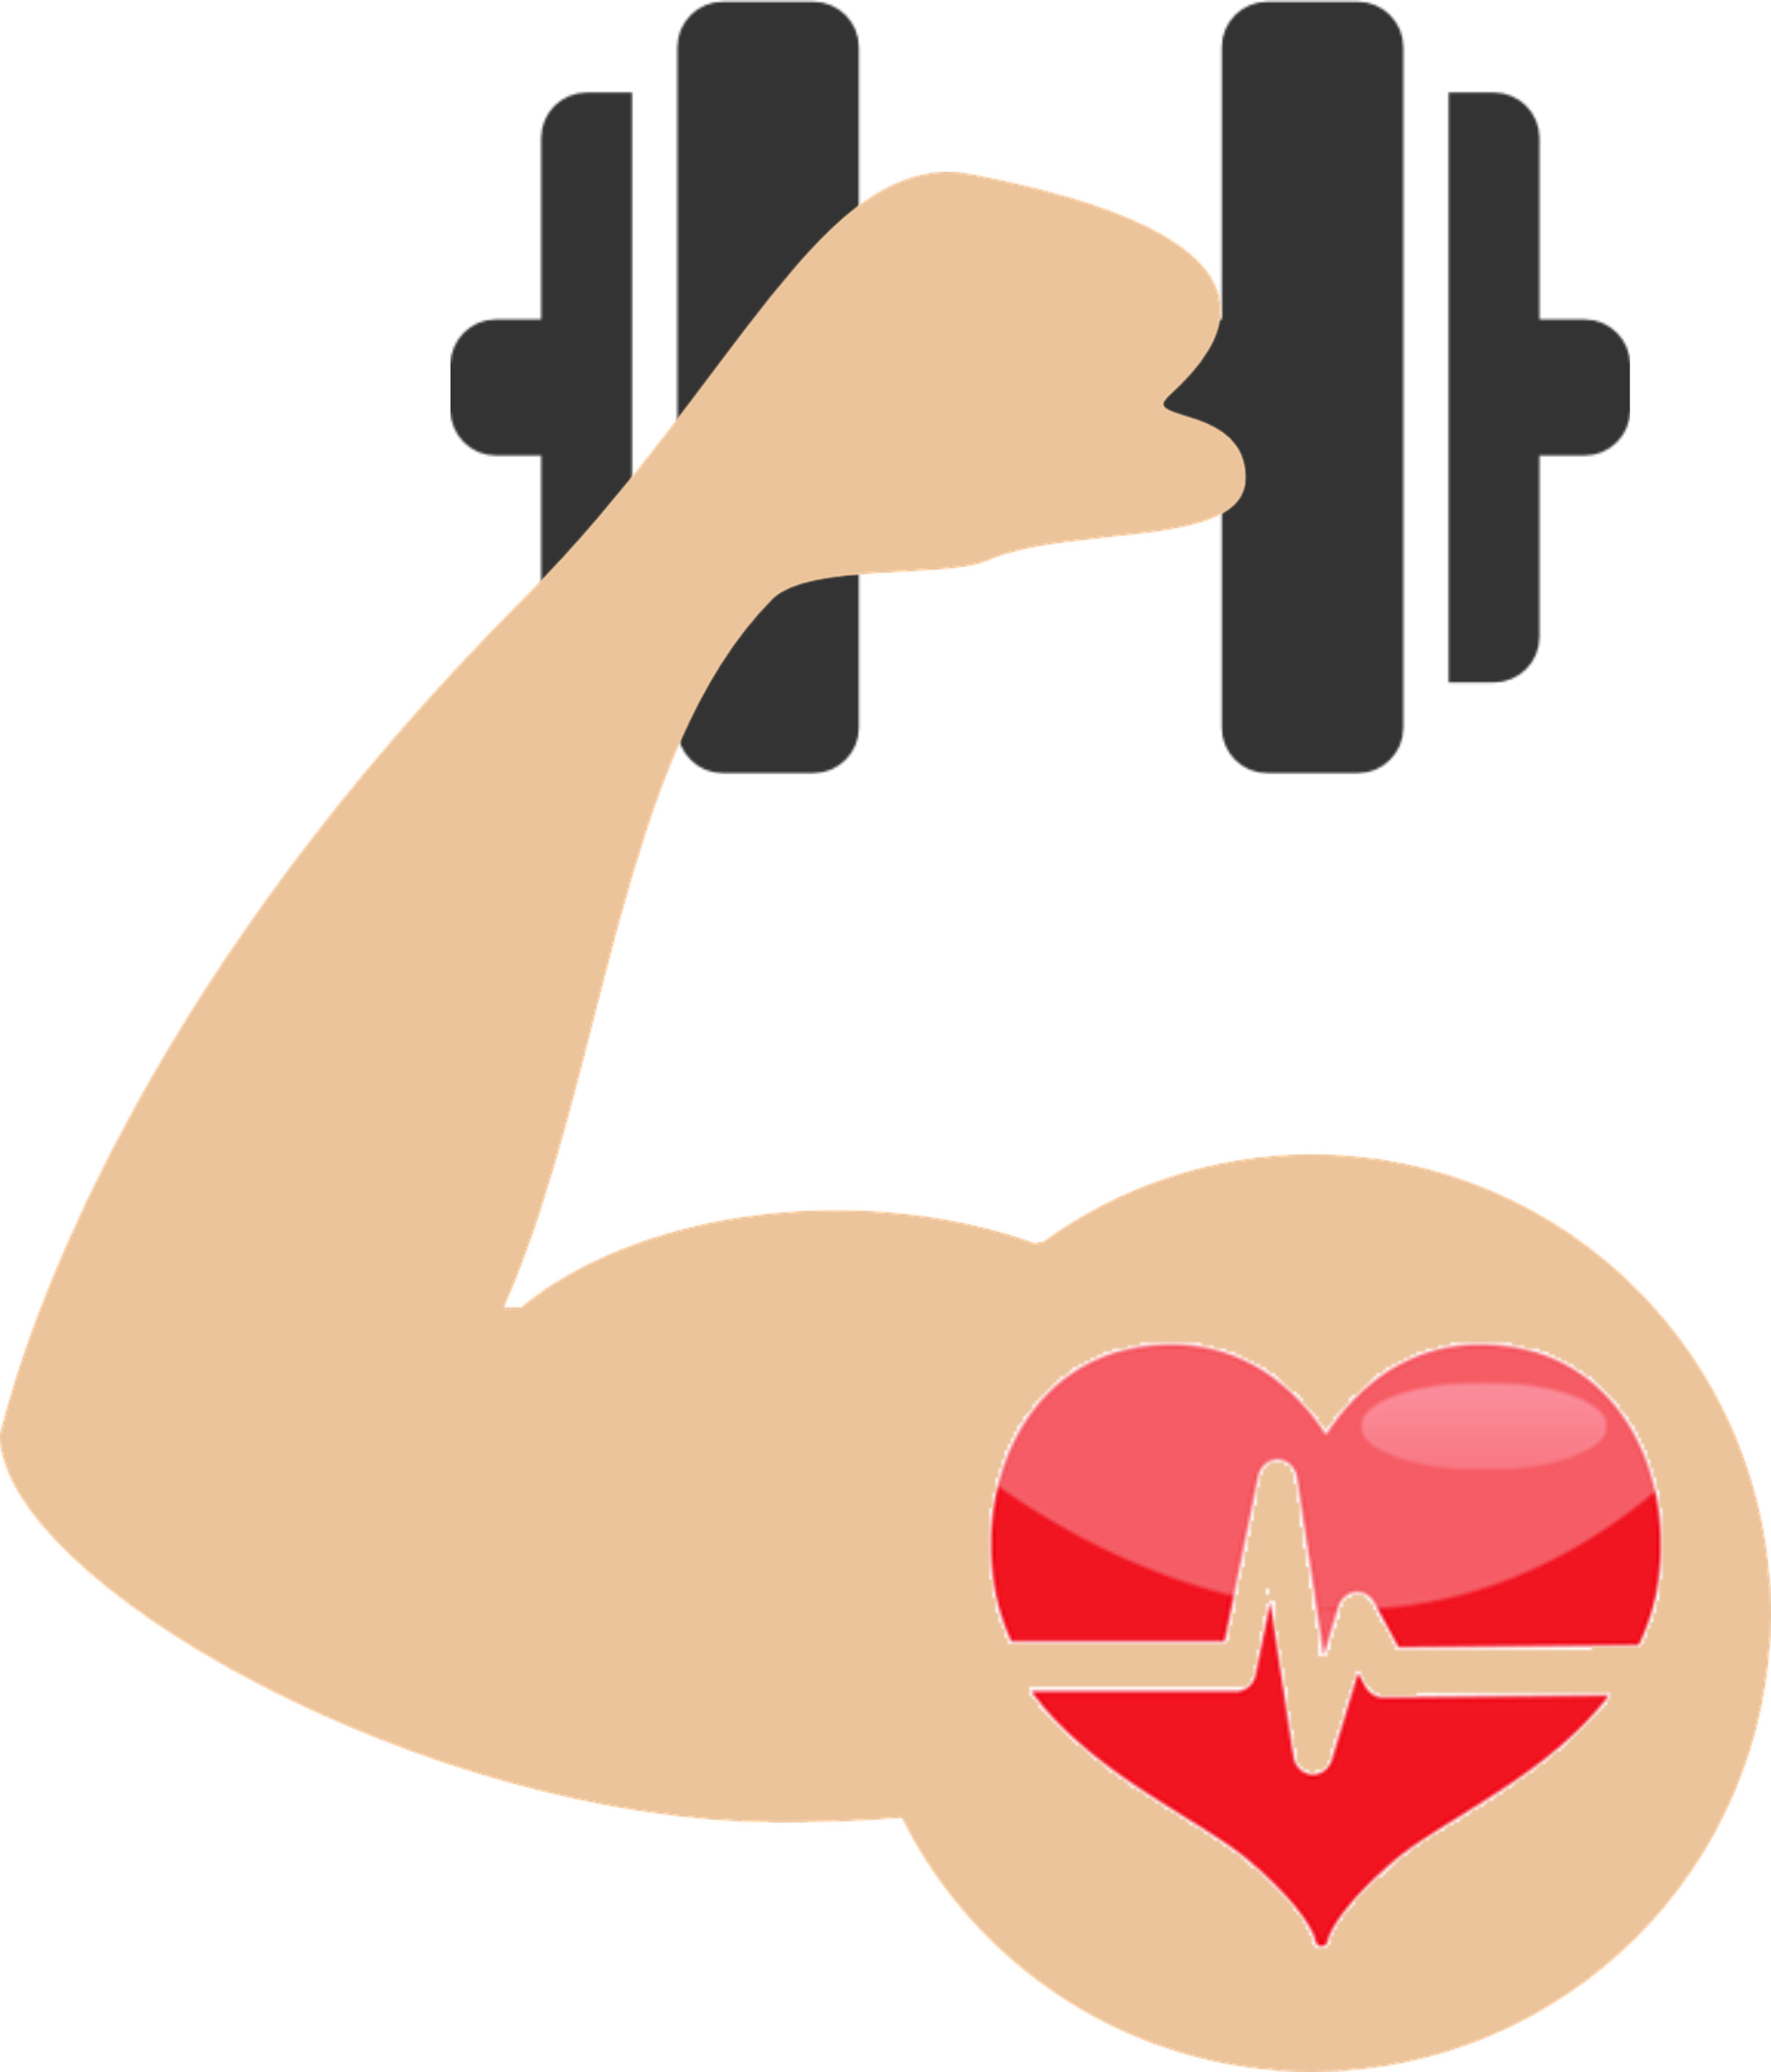 Fallo muscular. ¿Es efectivo?